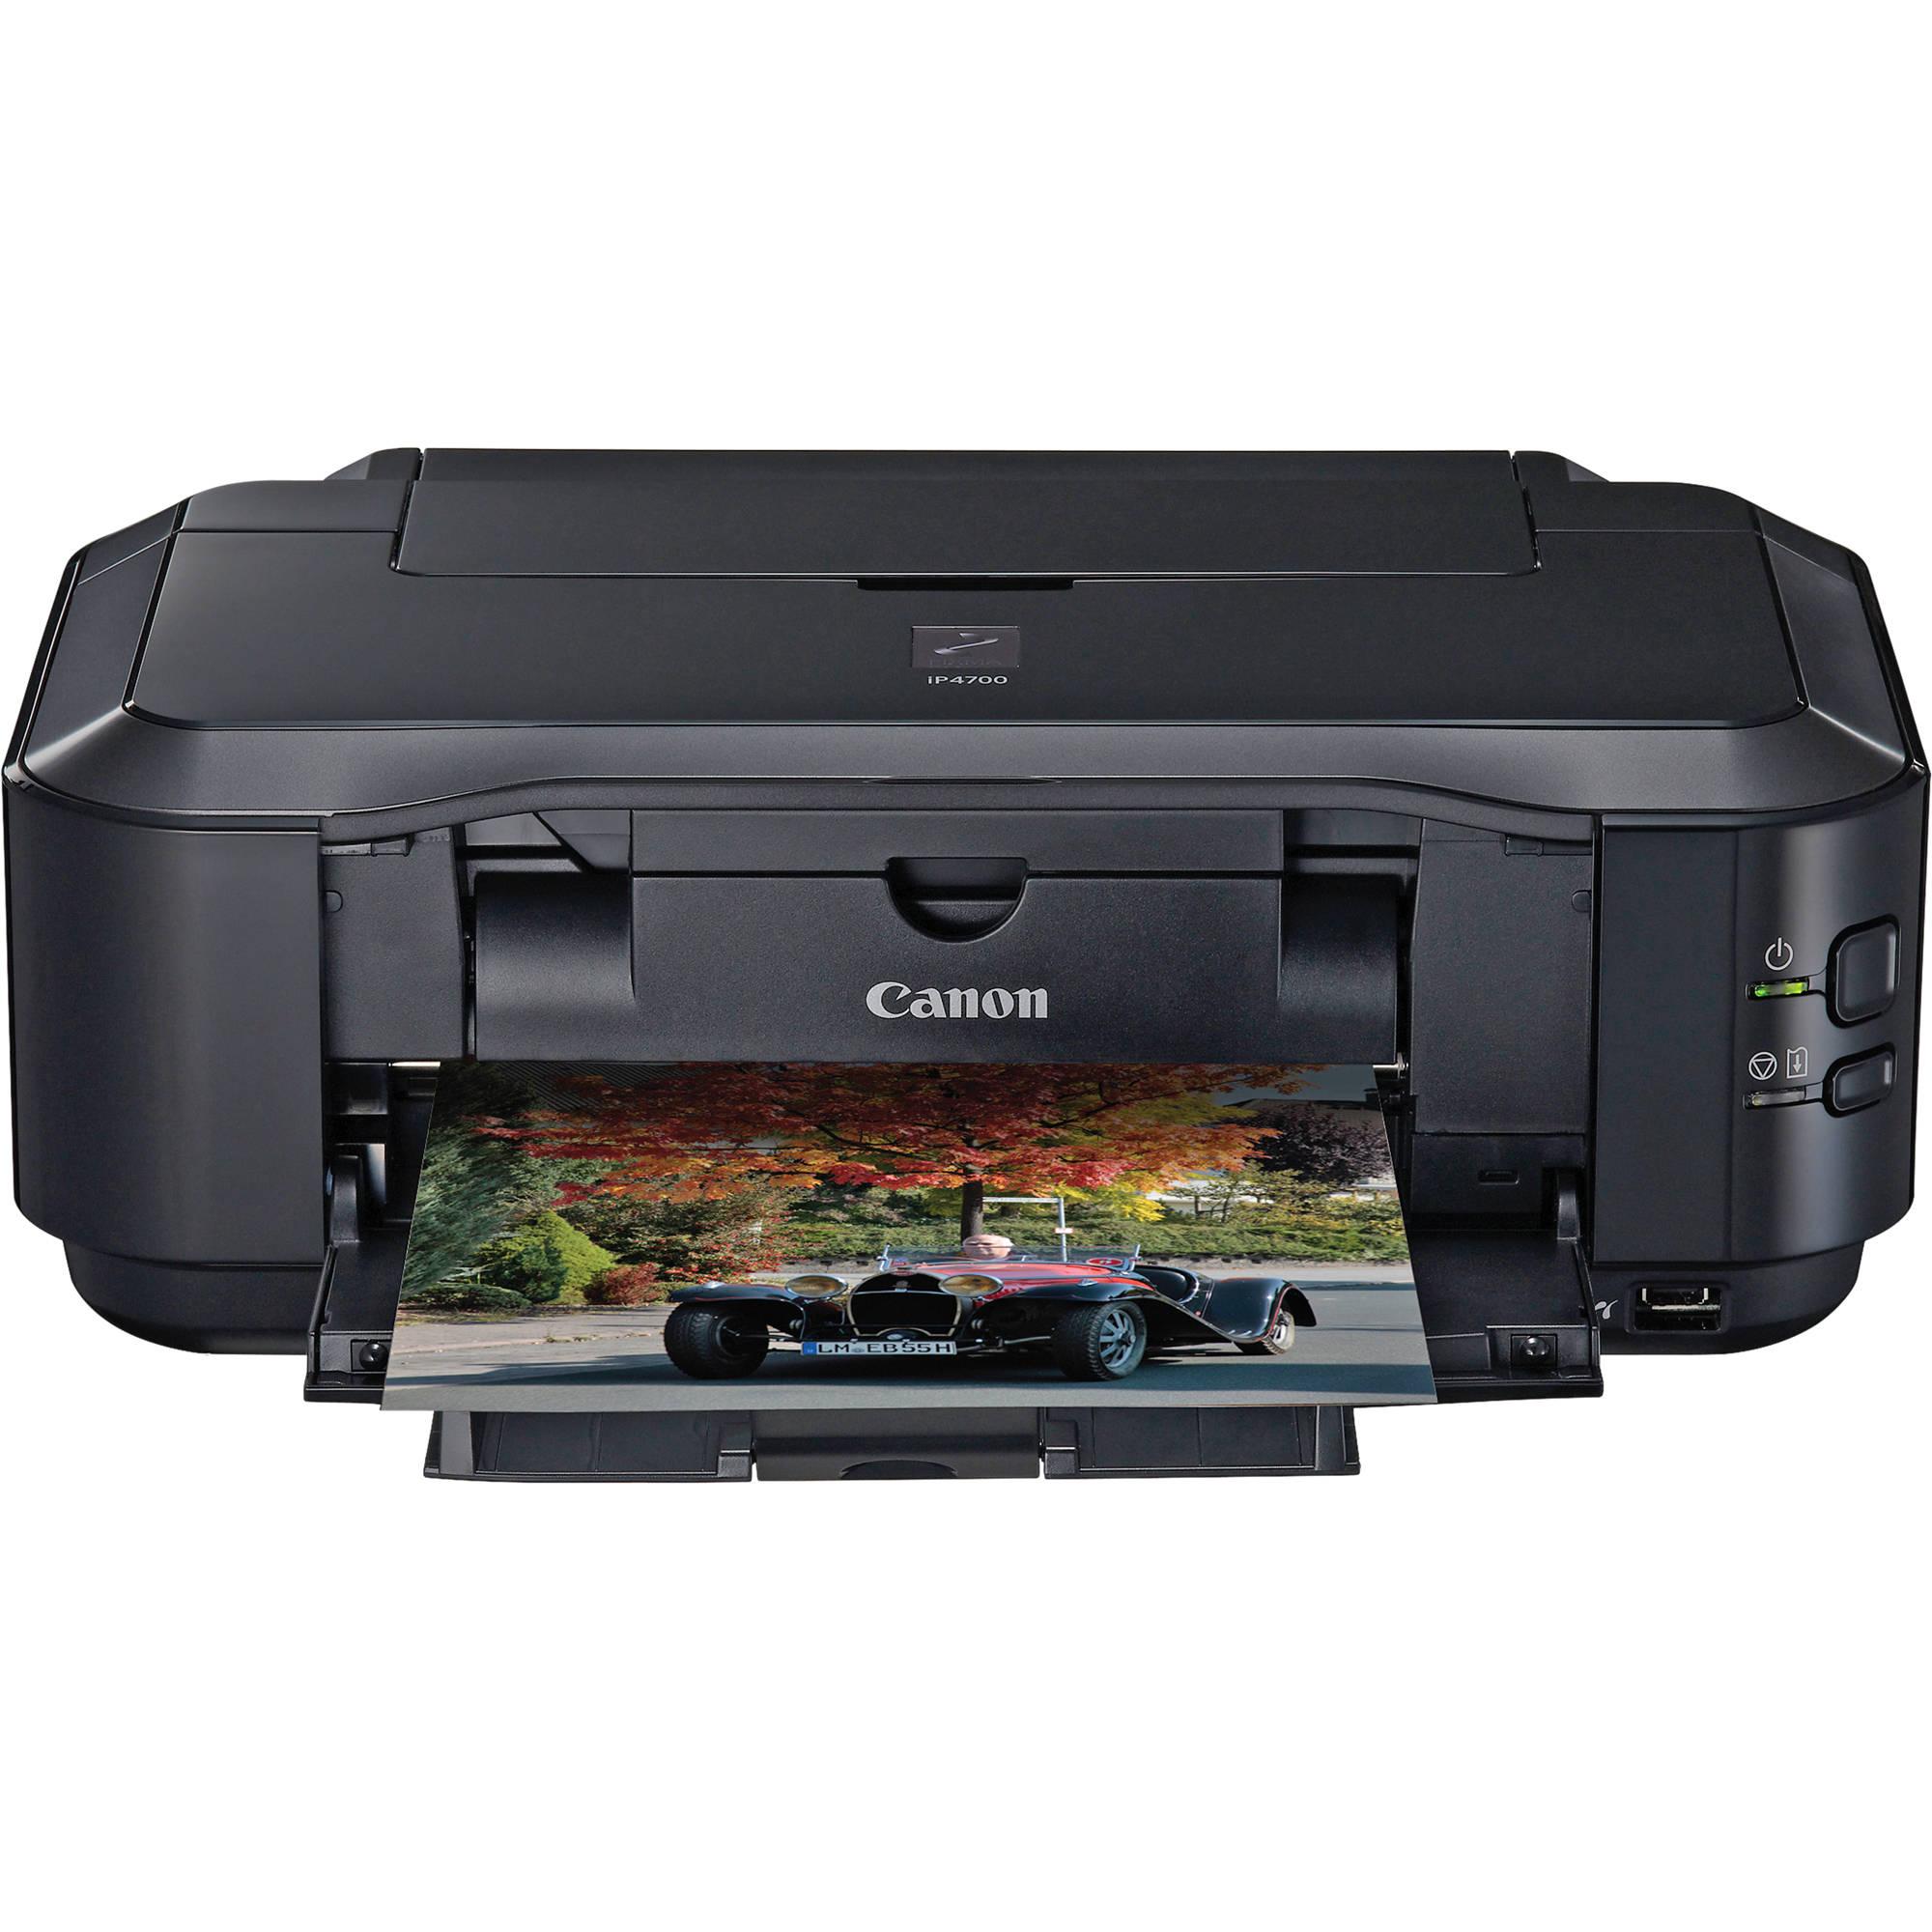 Canon pixma ip4700 photo printer